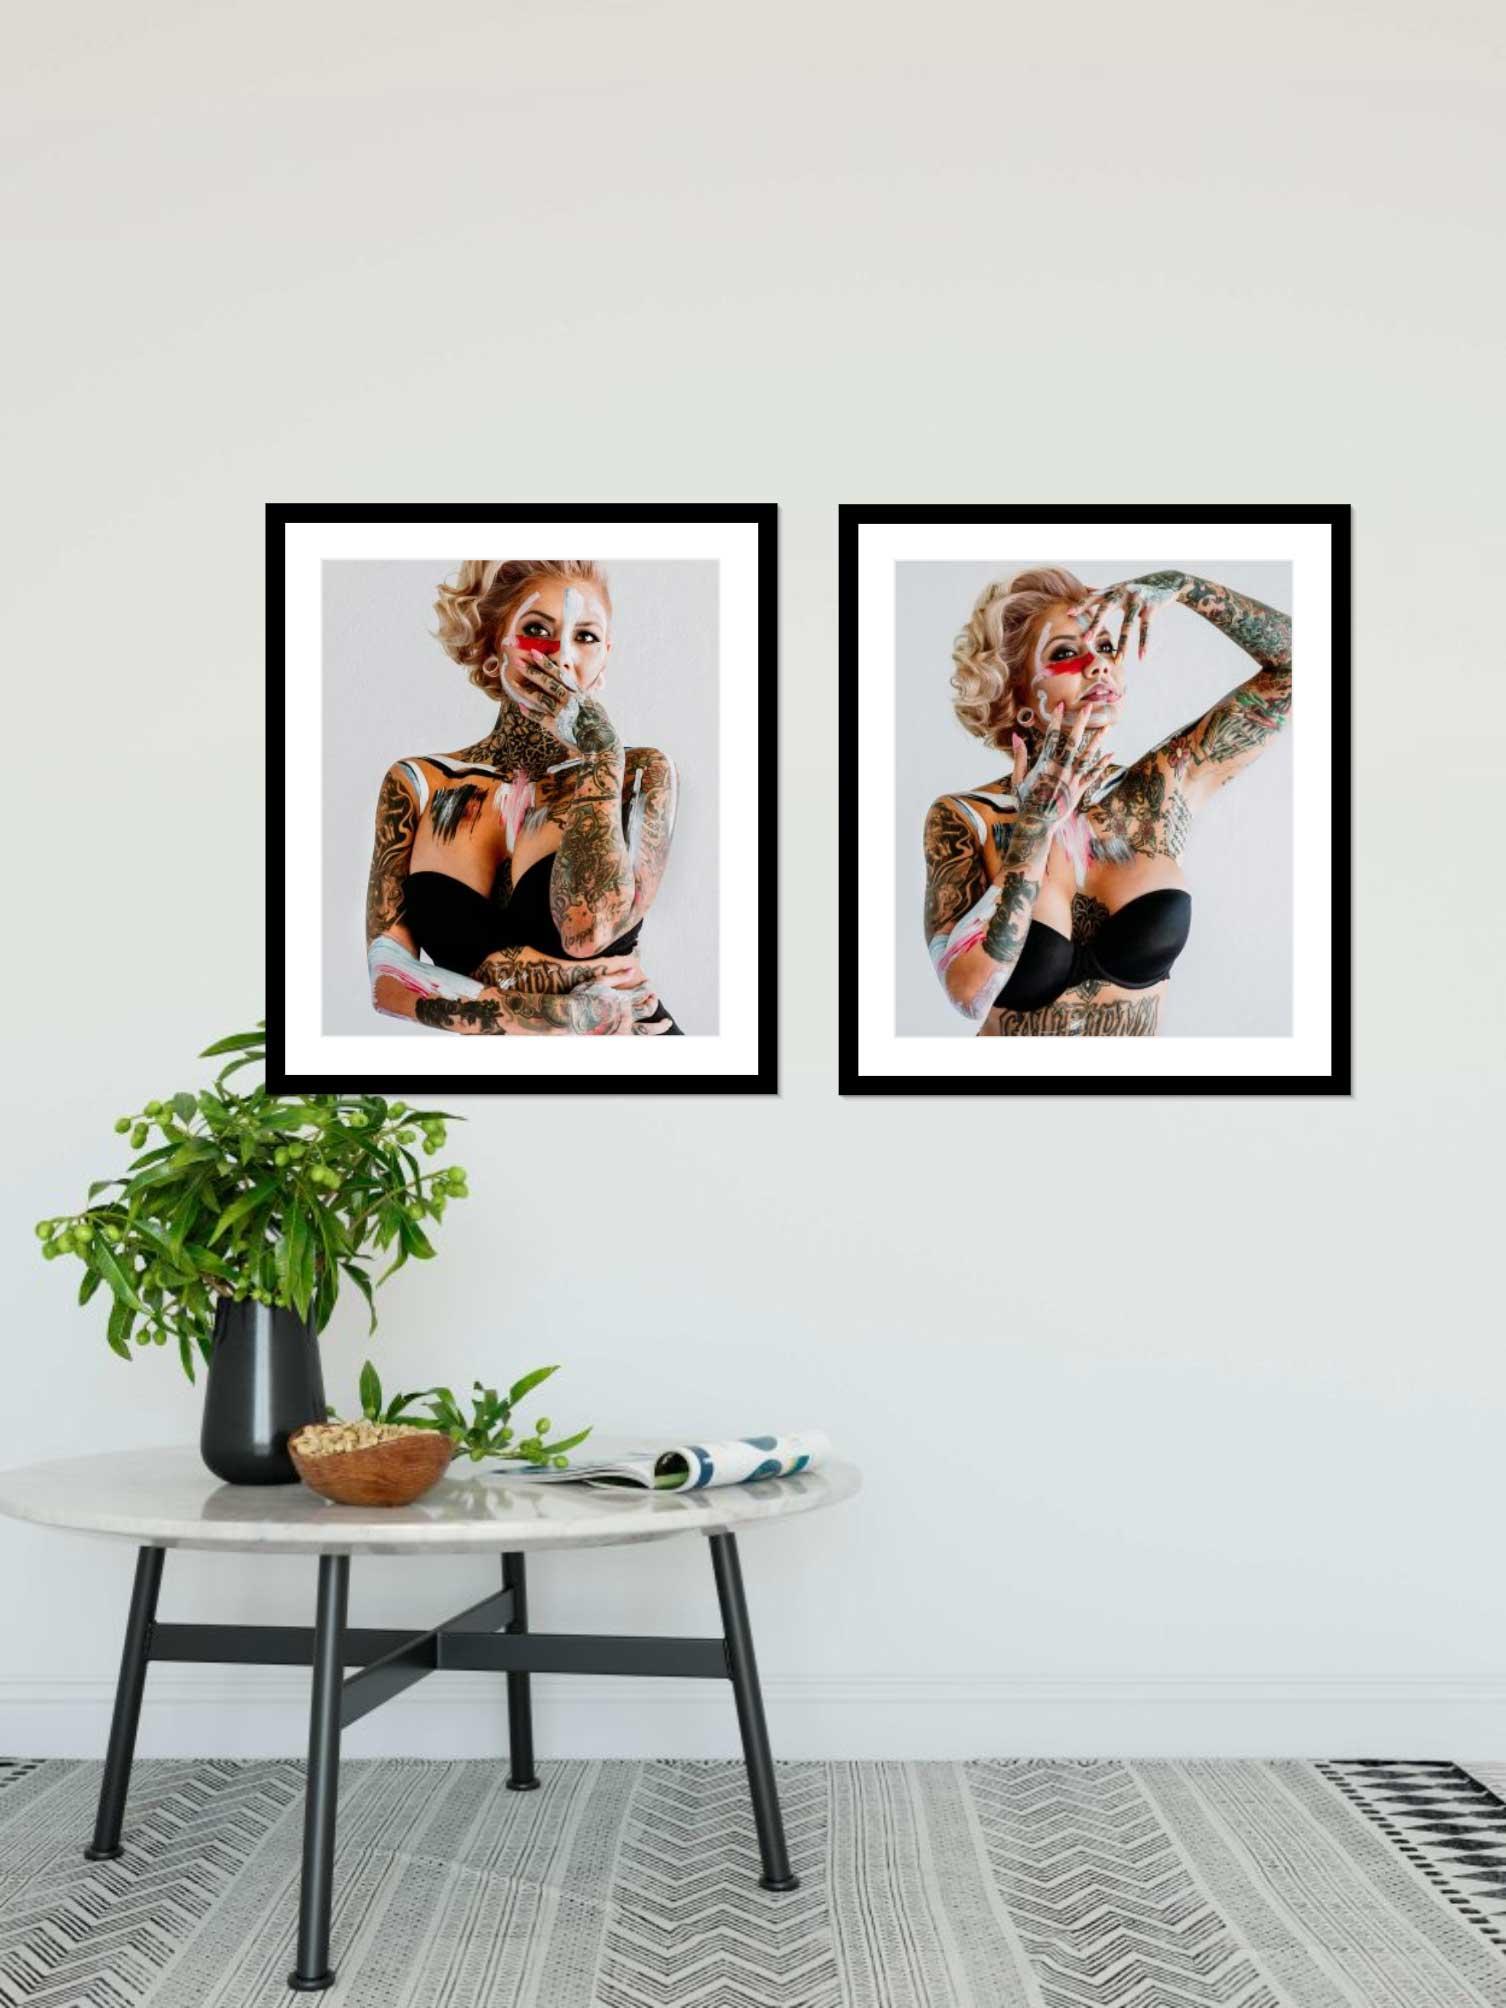 San Diego Portrait Photographer | Reese Hilburn | Prints | Frames